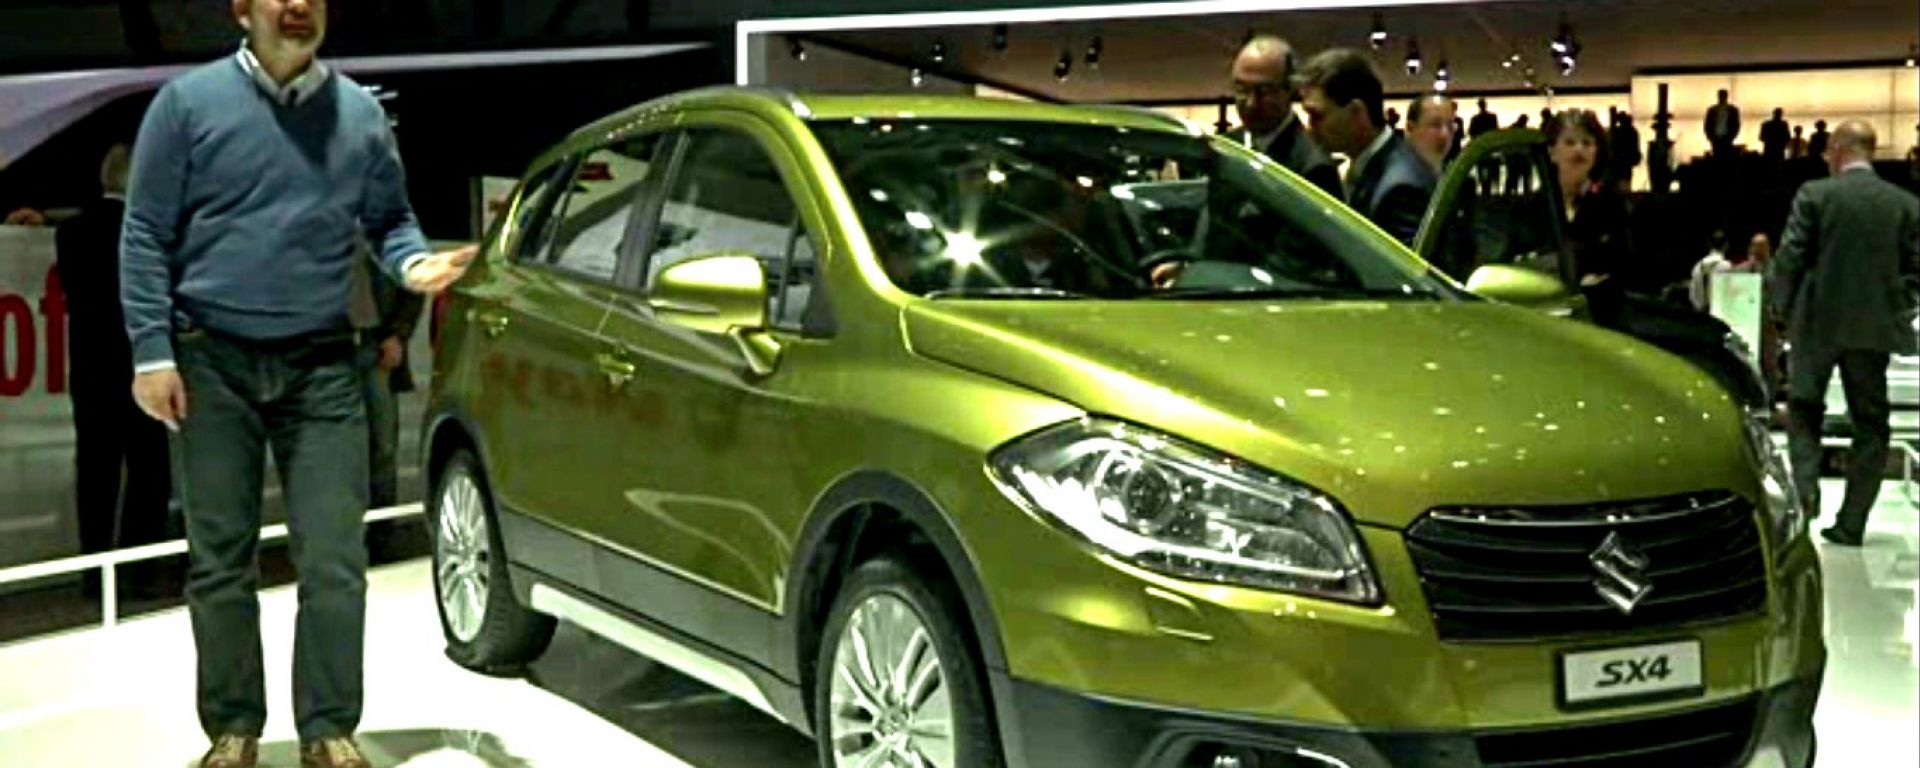 Salone di Ginevra 2013: Suzuki